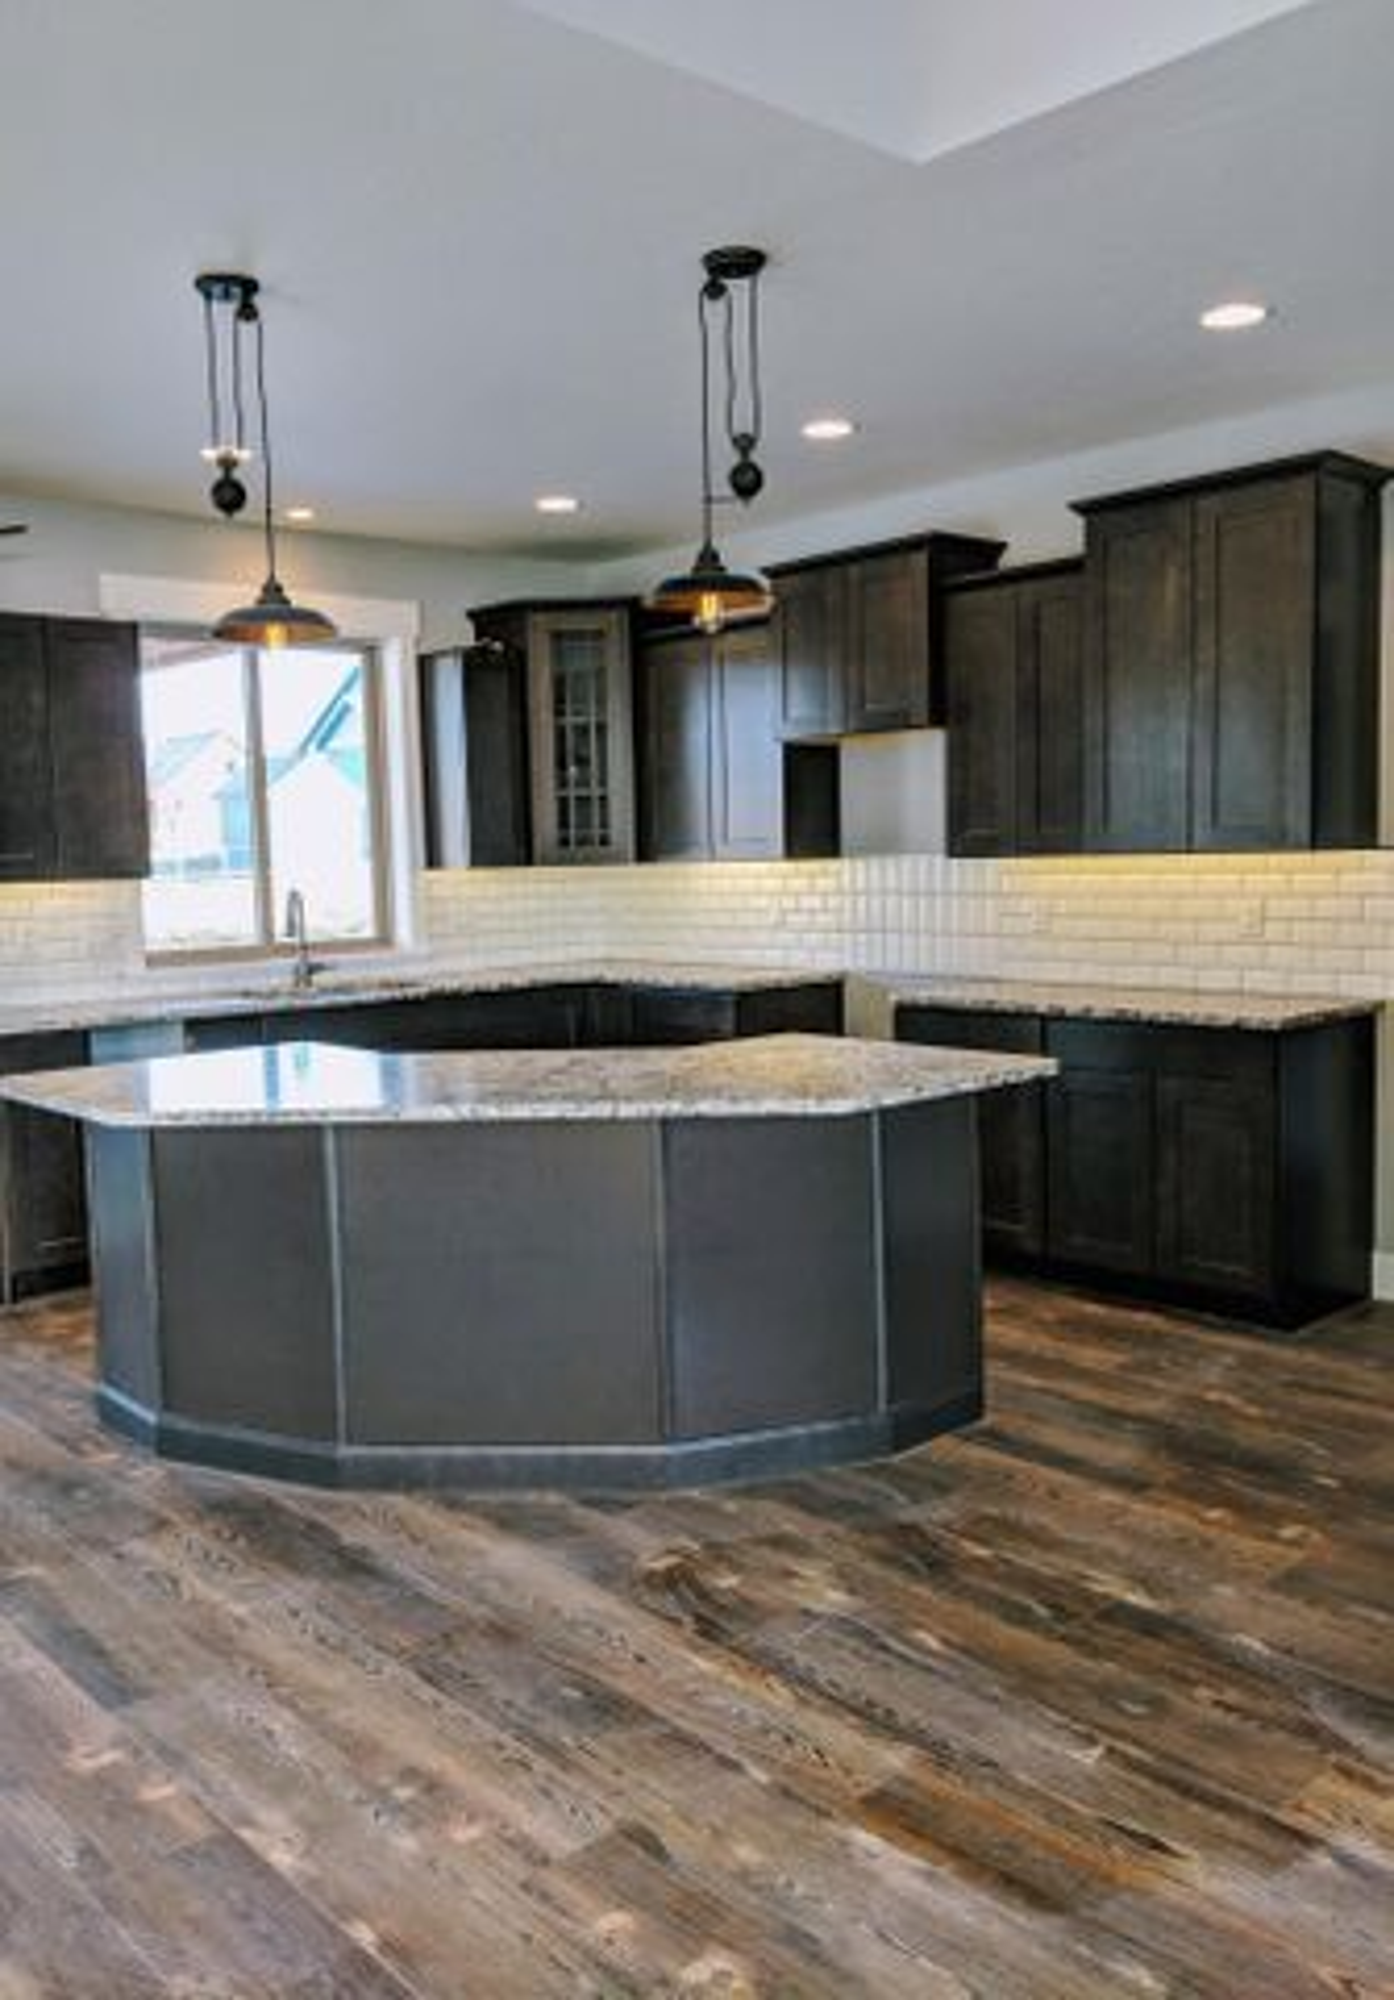 Spacious Kitchen $4,500 Appliance Allowance